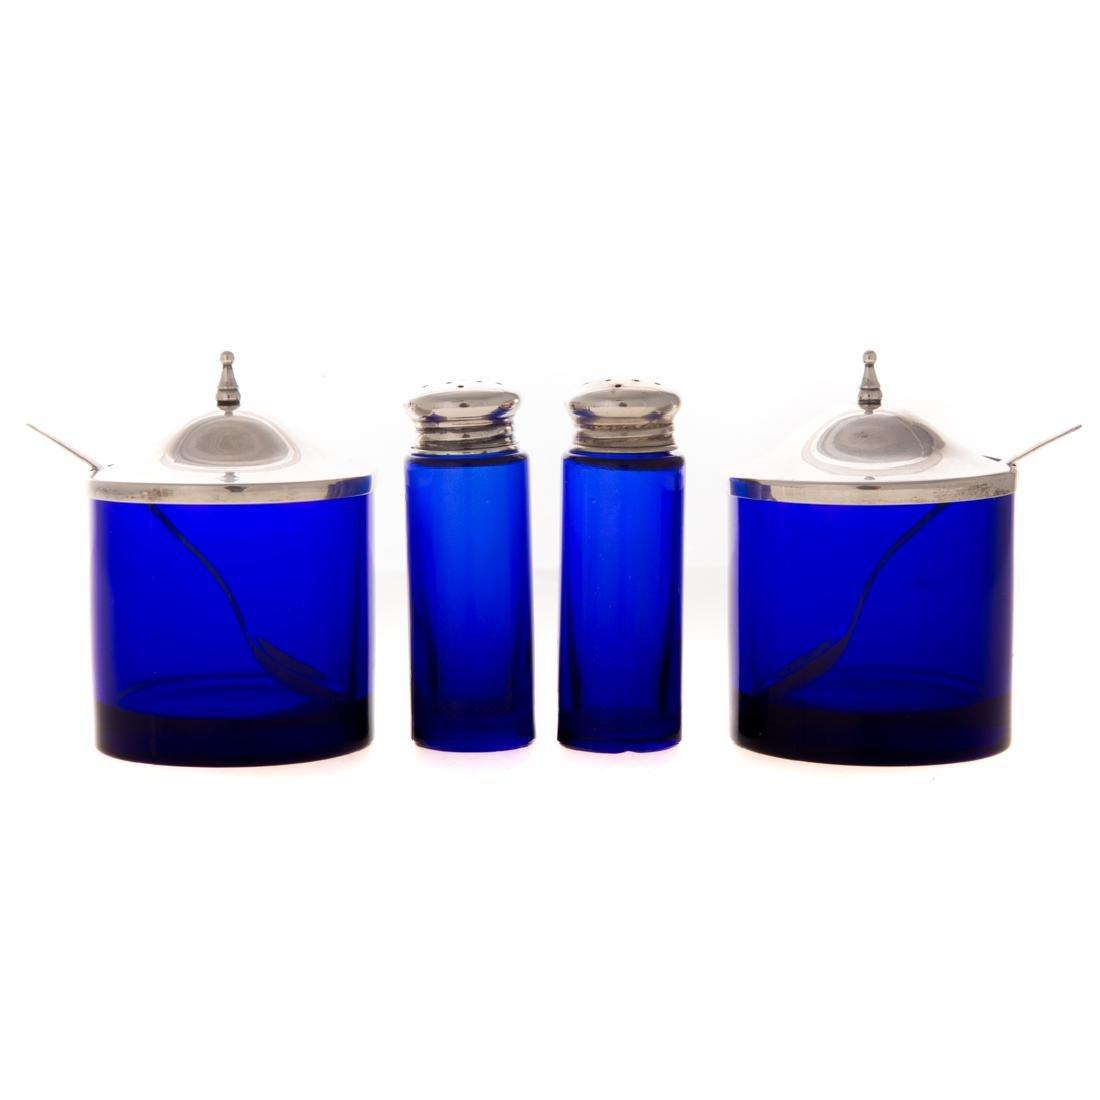 Webster sterling & cobalt glass condiment caddy - 3